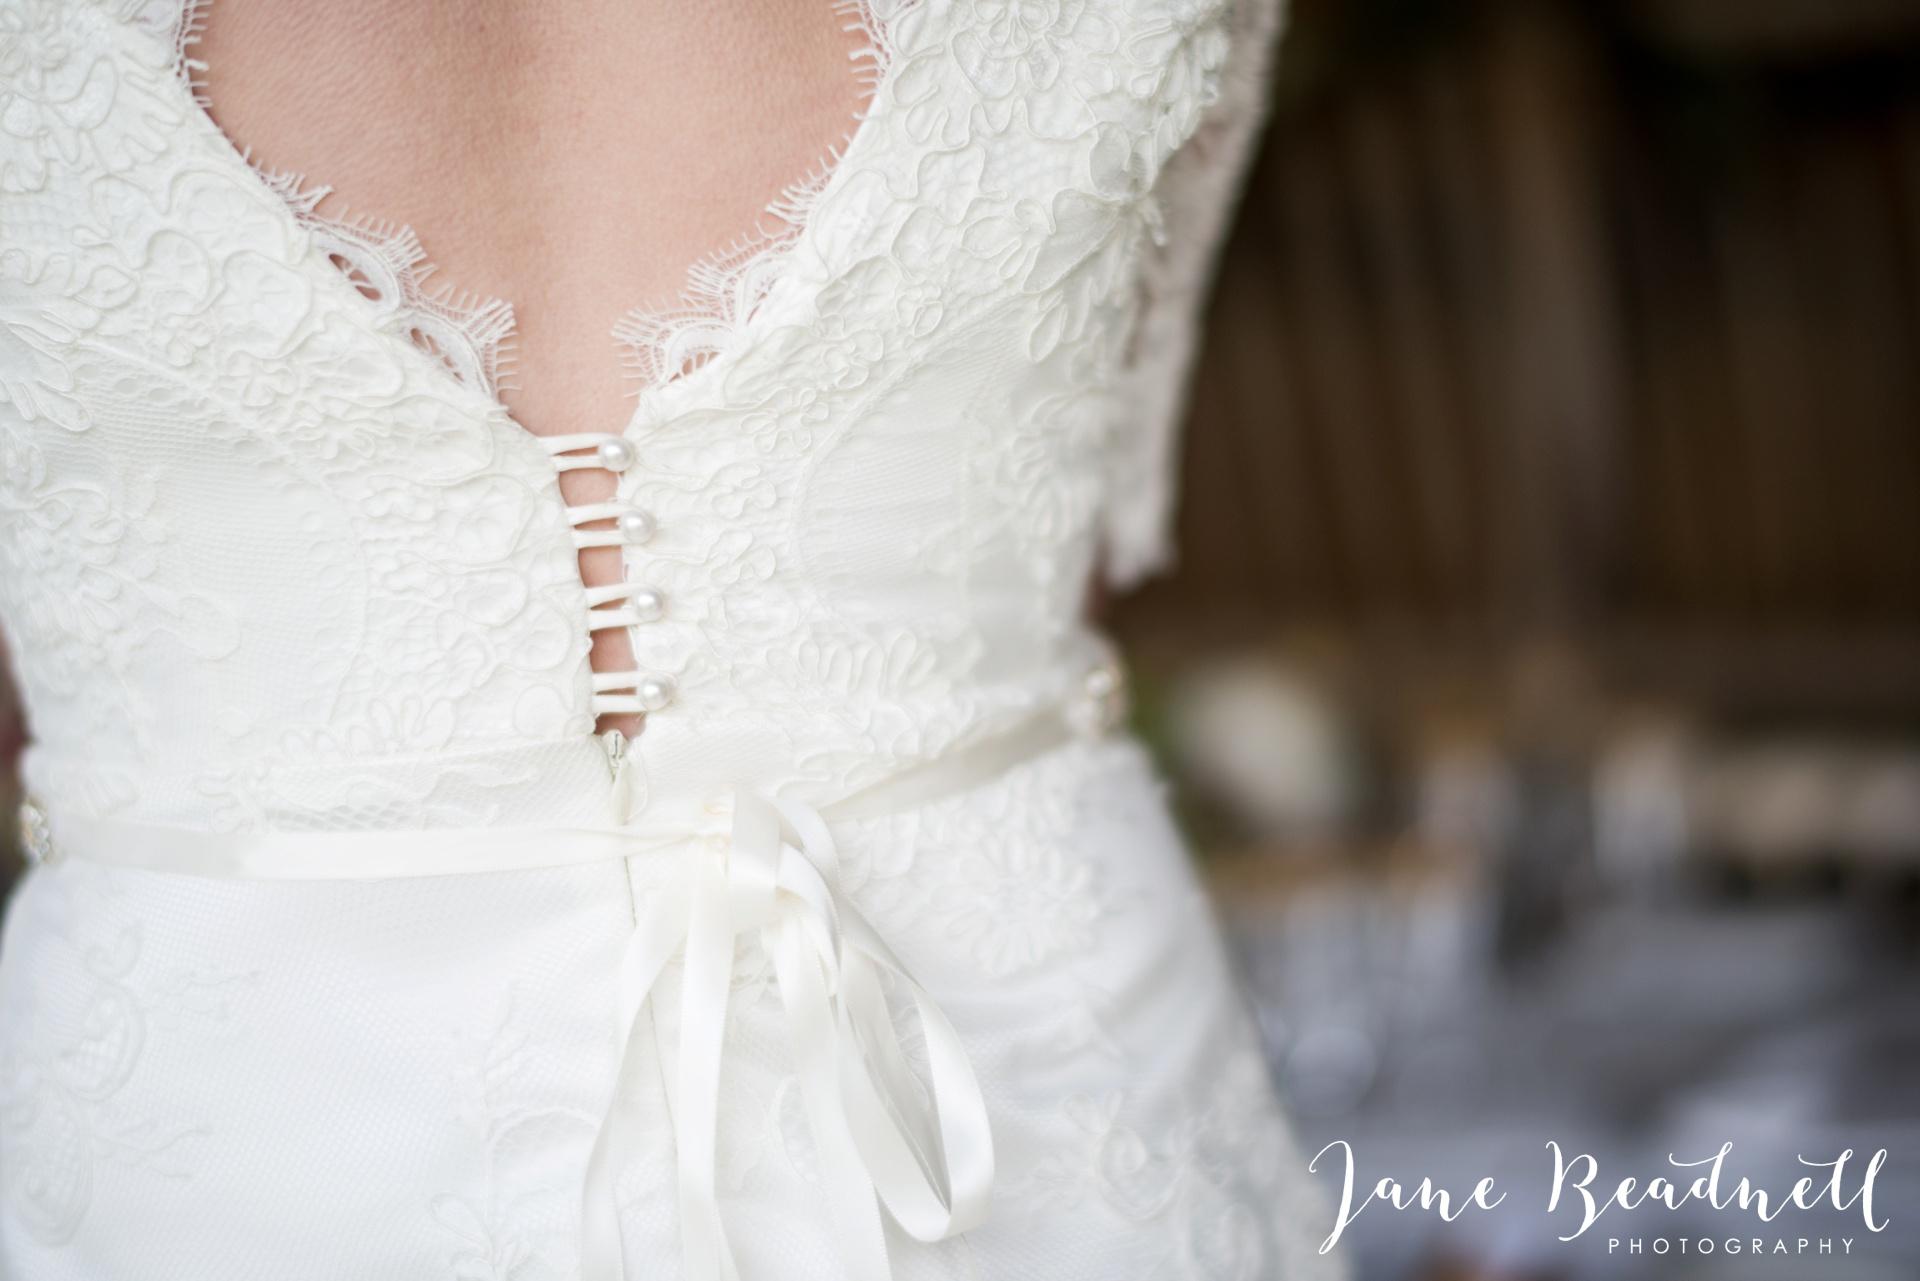 Jane Beadnell fine art wedding photographer Swinton Park21